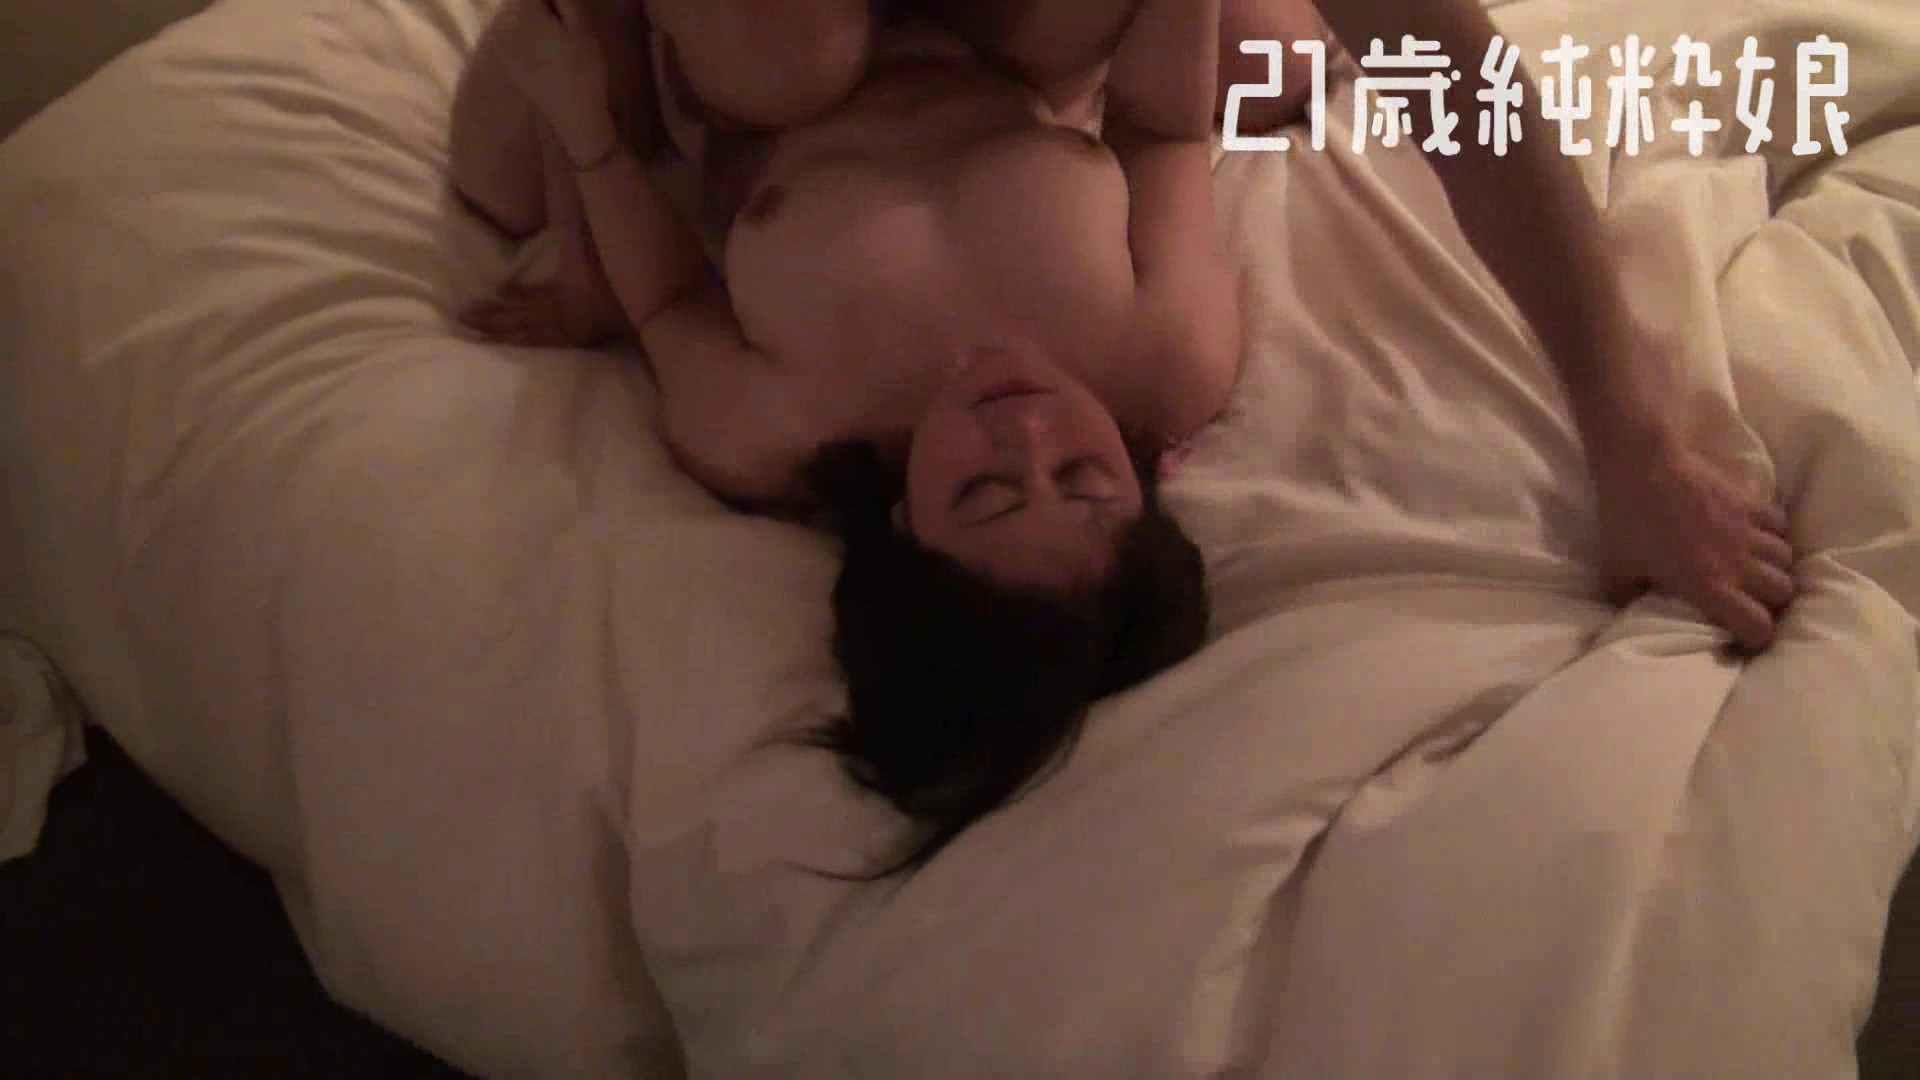 Gカップ21歳純粋嬢第2弾Vol.4 OL裸体 | 学校  65画像 50